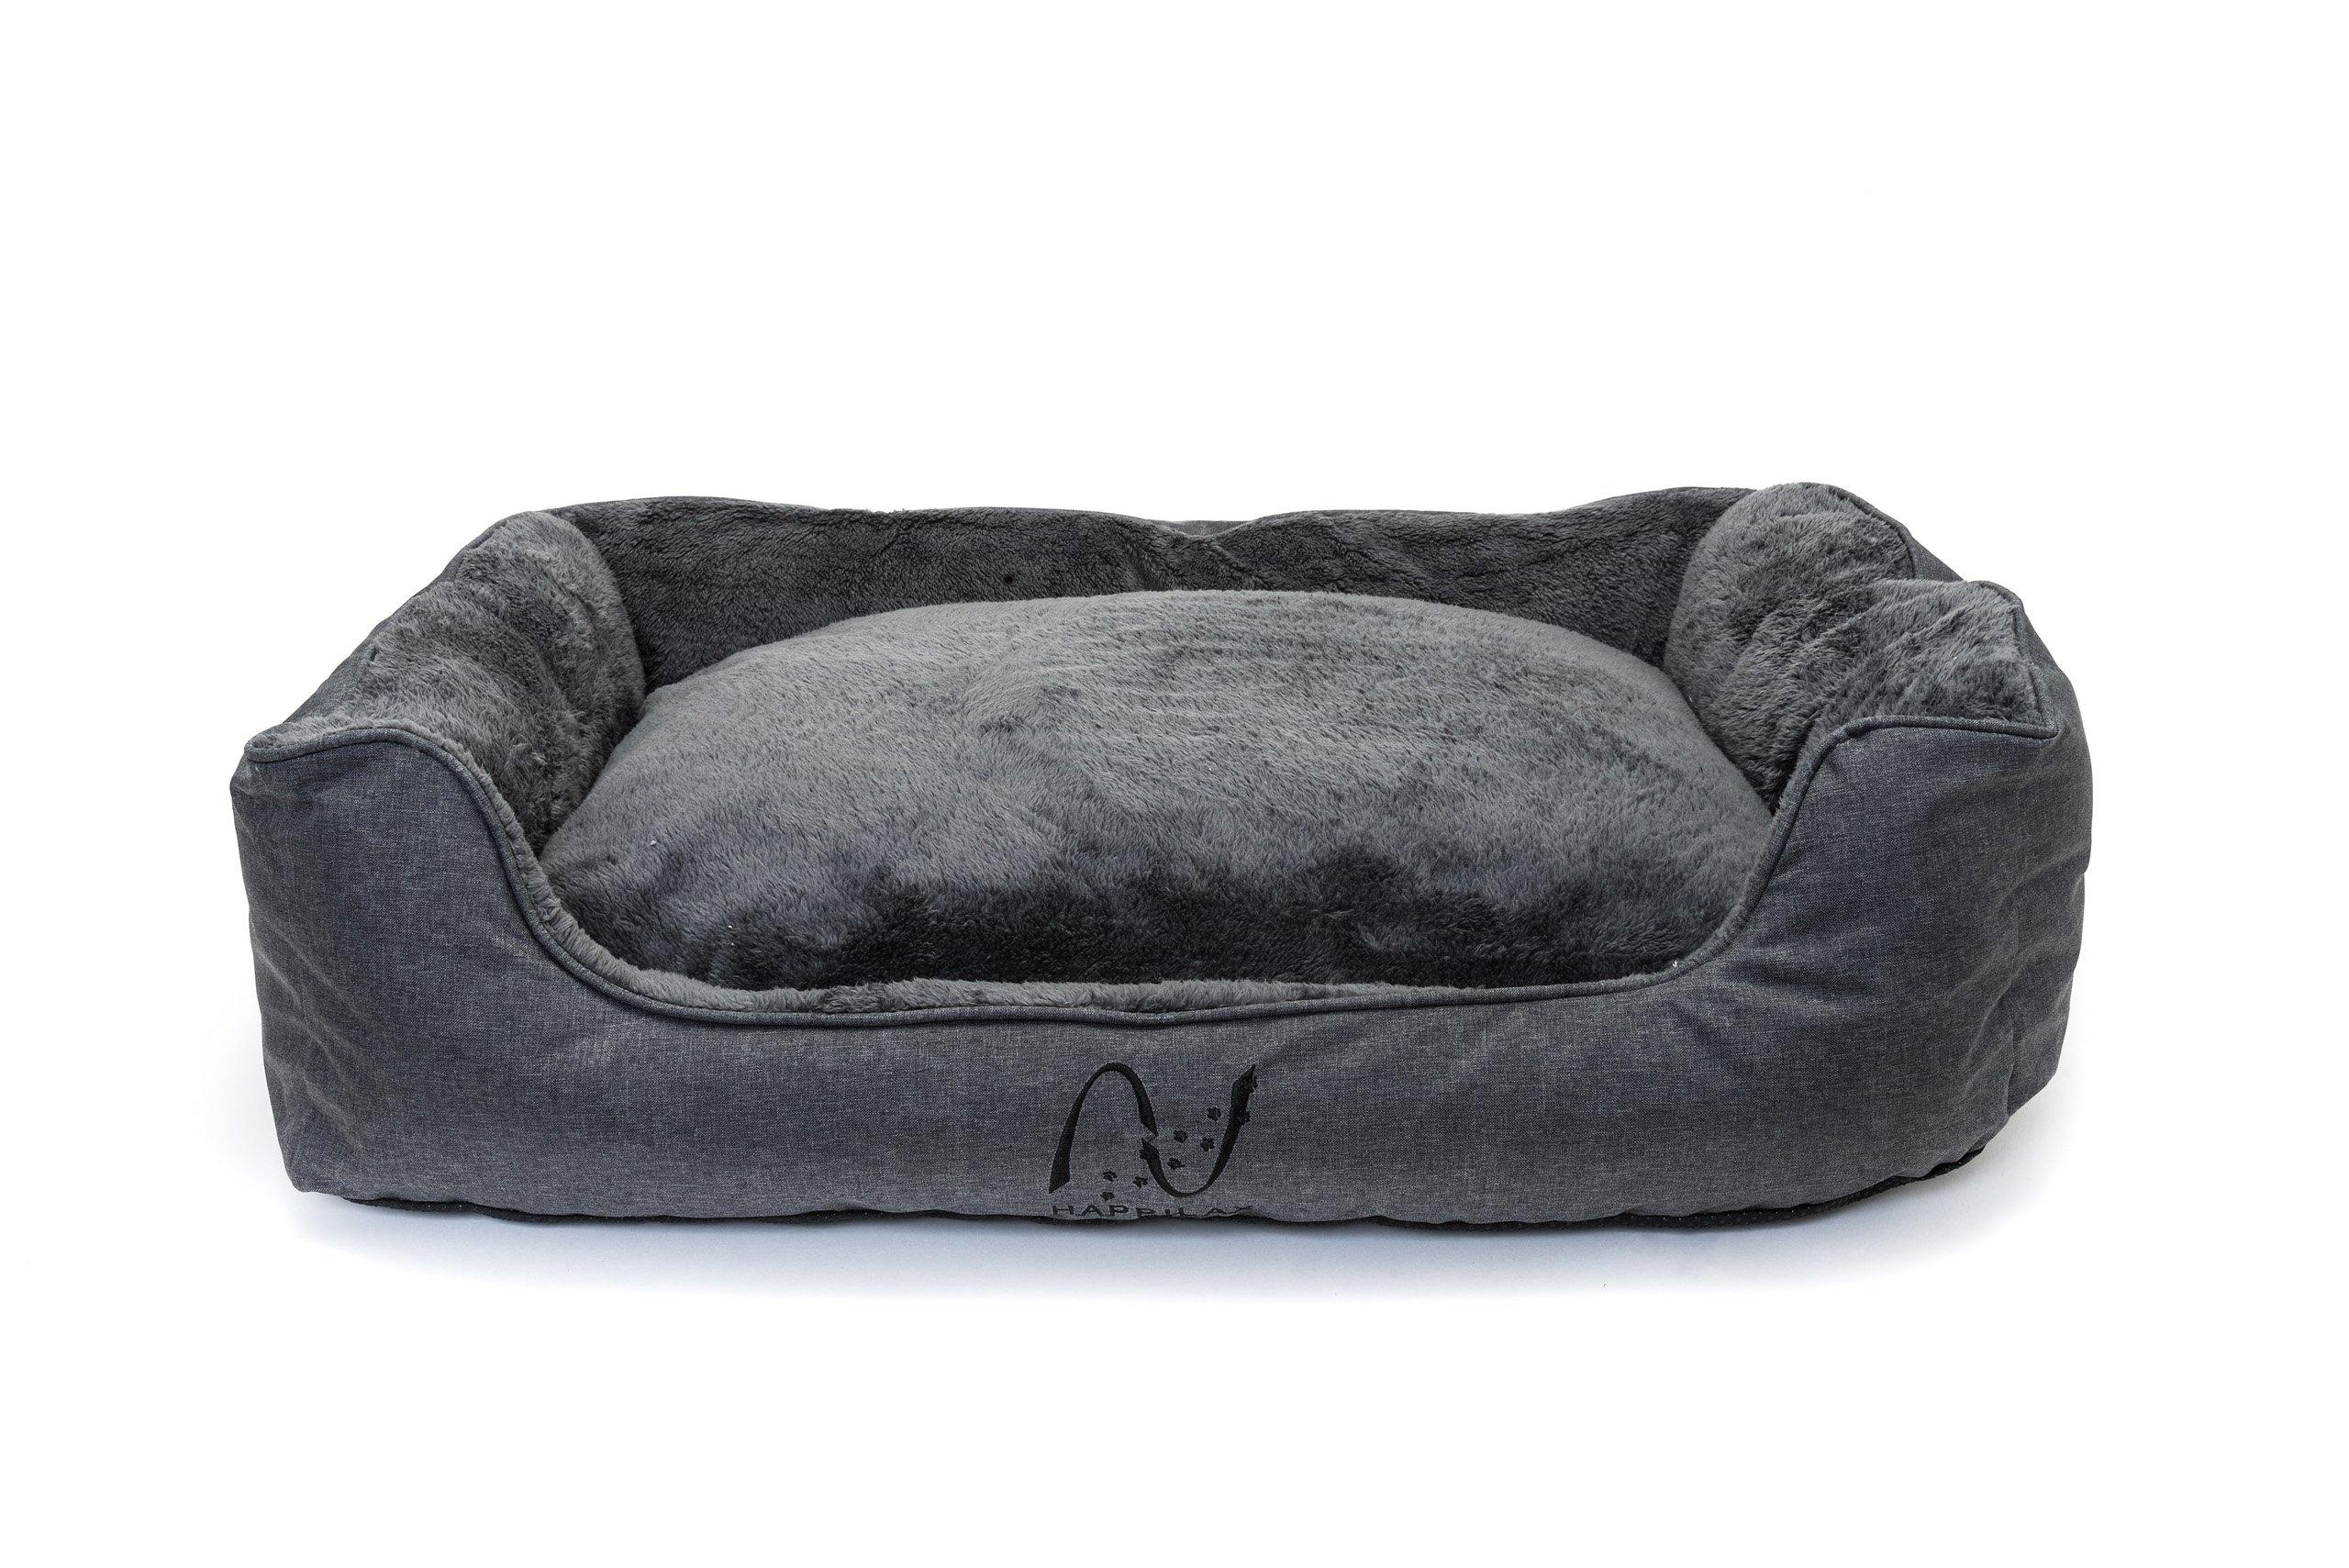 Happilax Cama perro grande lavable con almohada de felpa reversible, Talla L product image